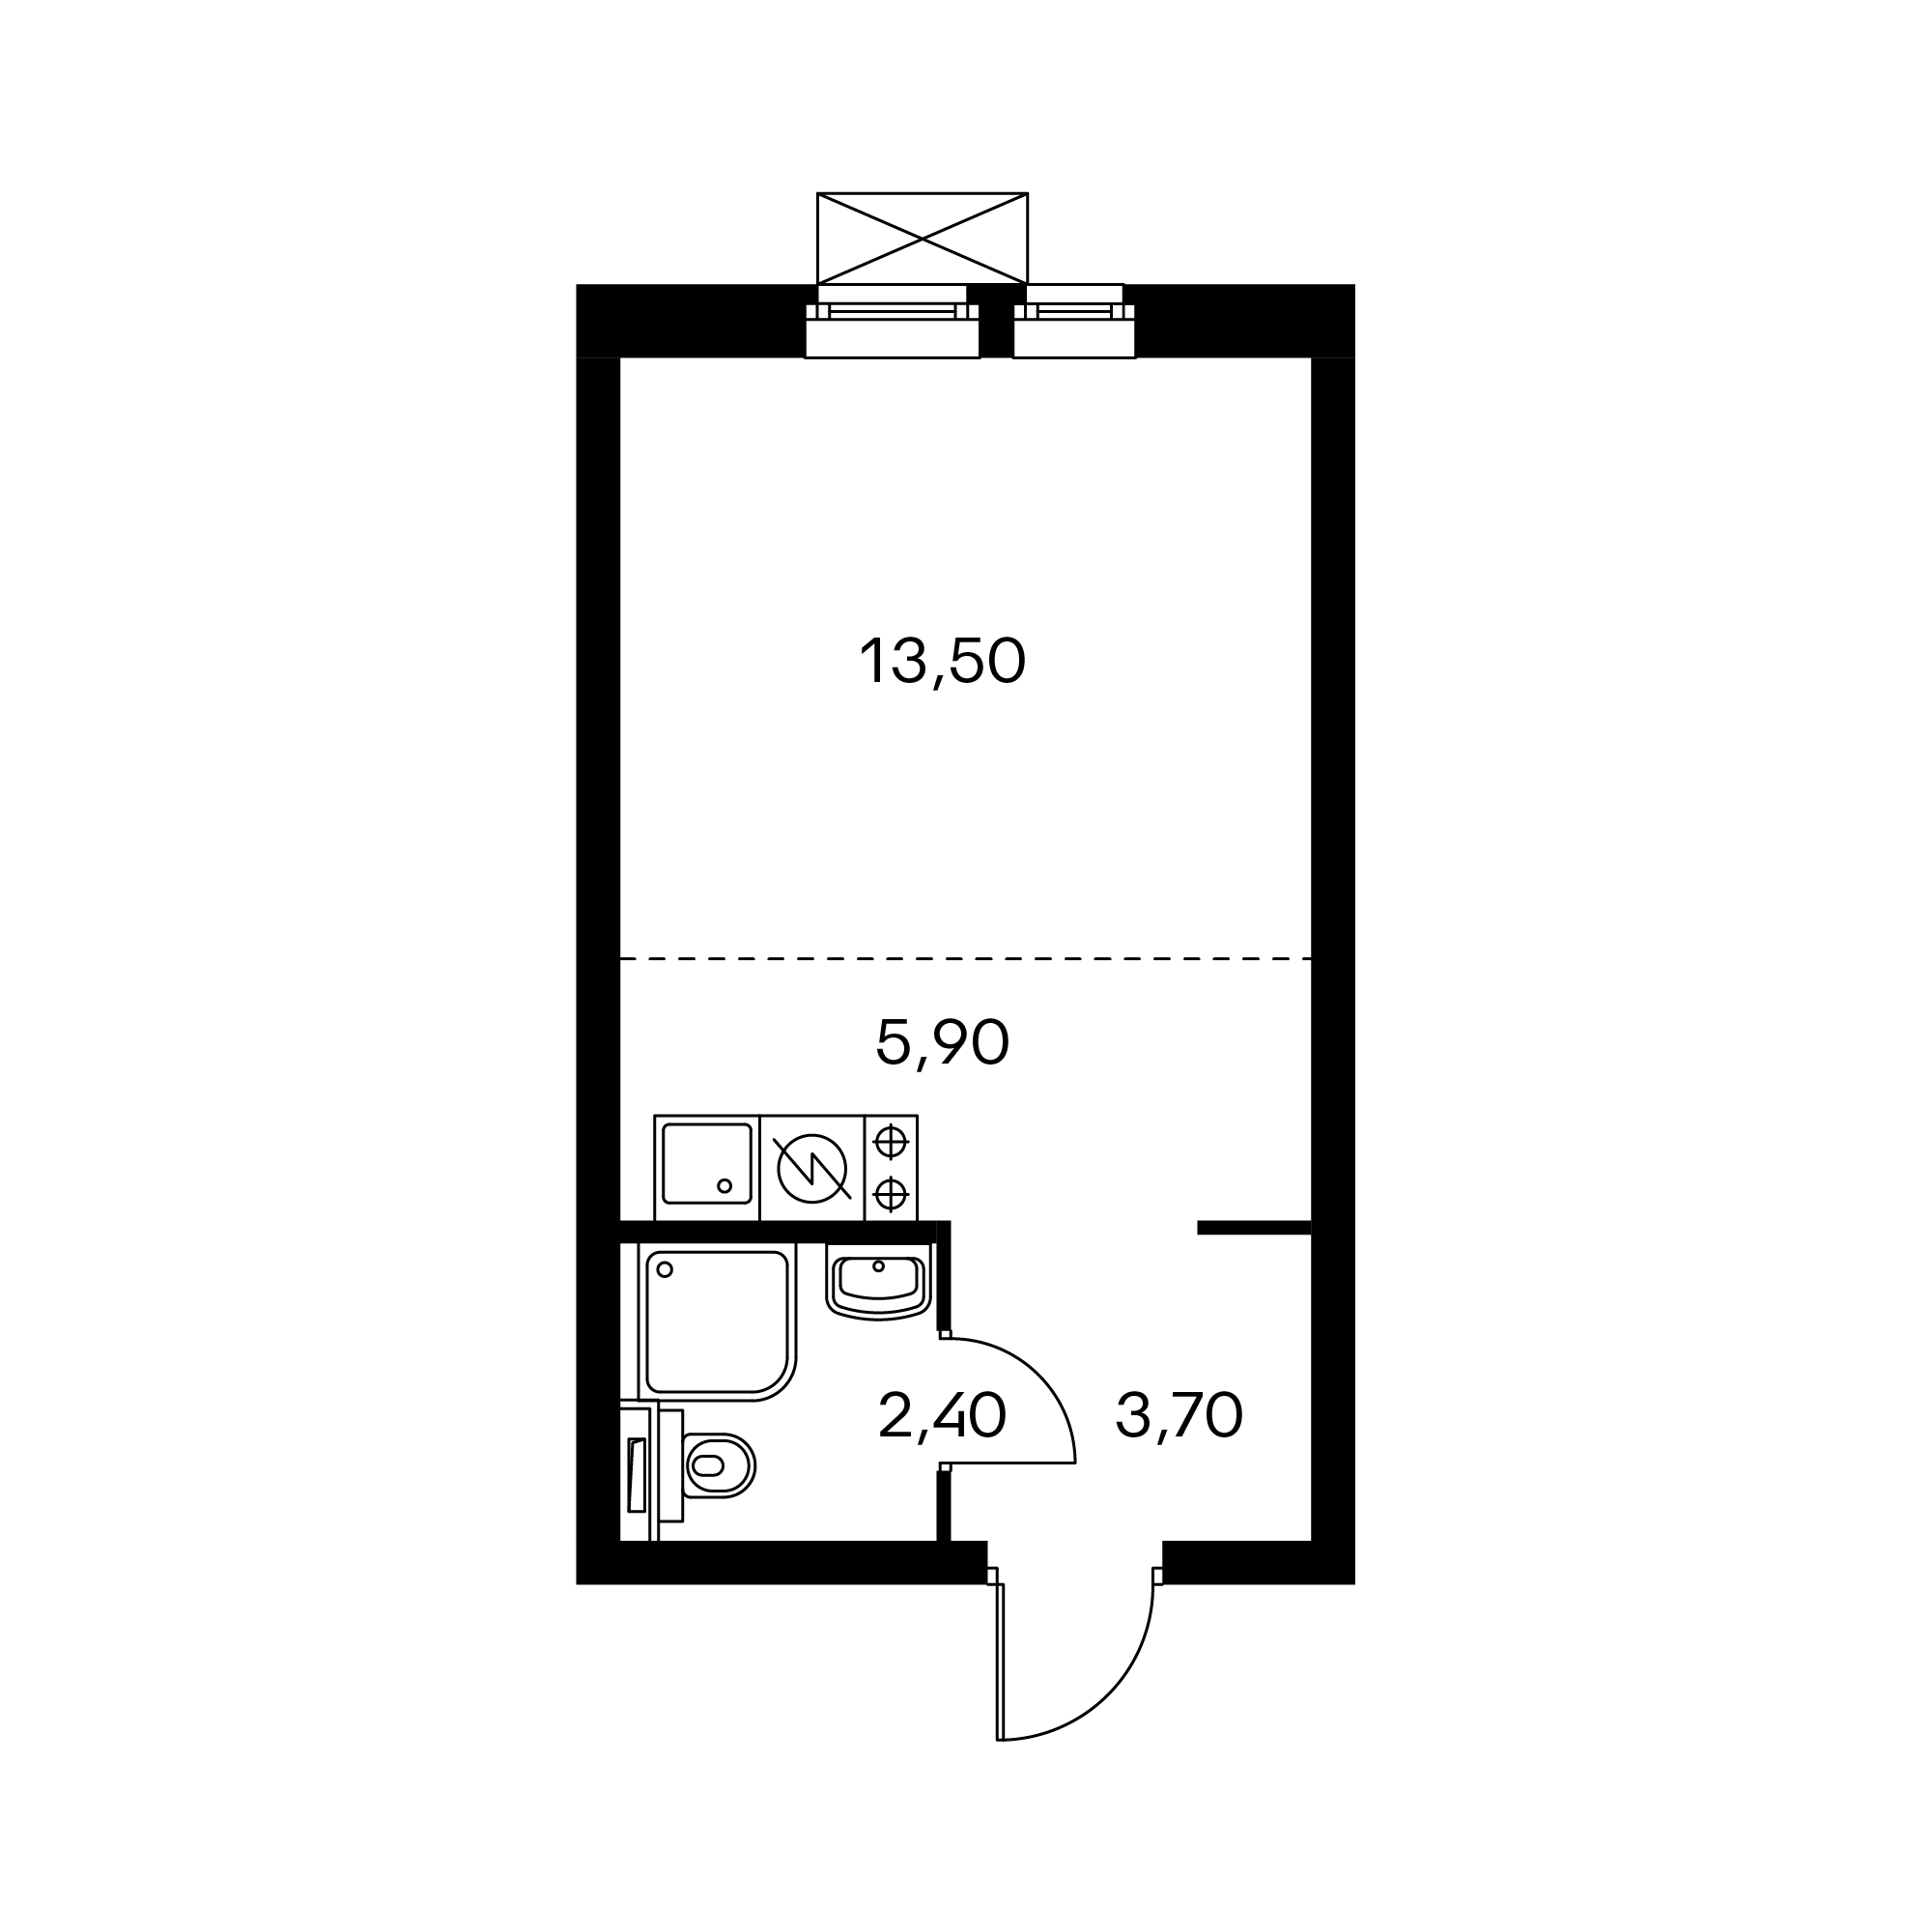 1NM1_4.2-1